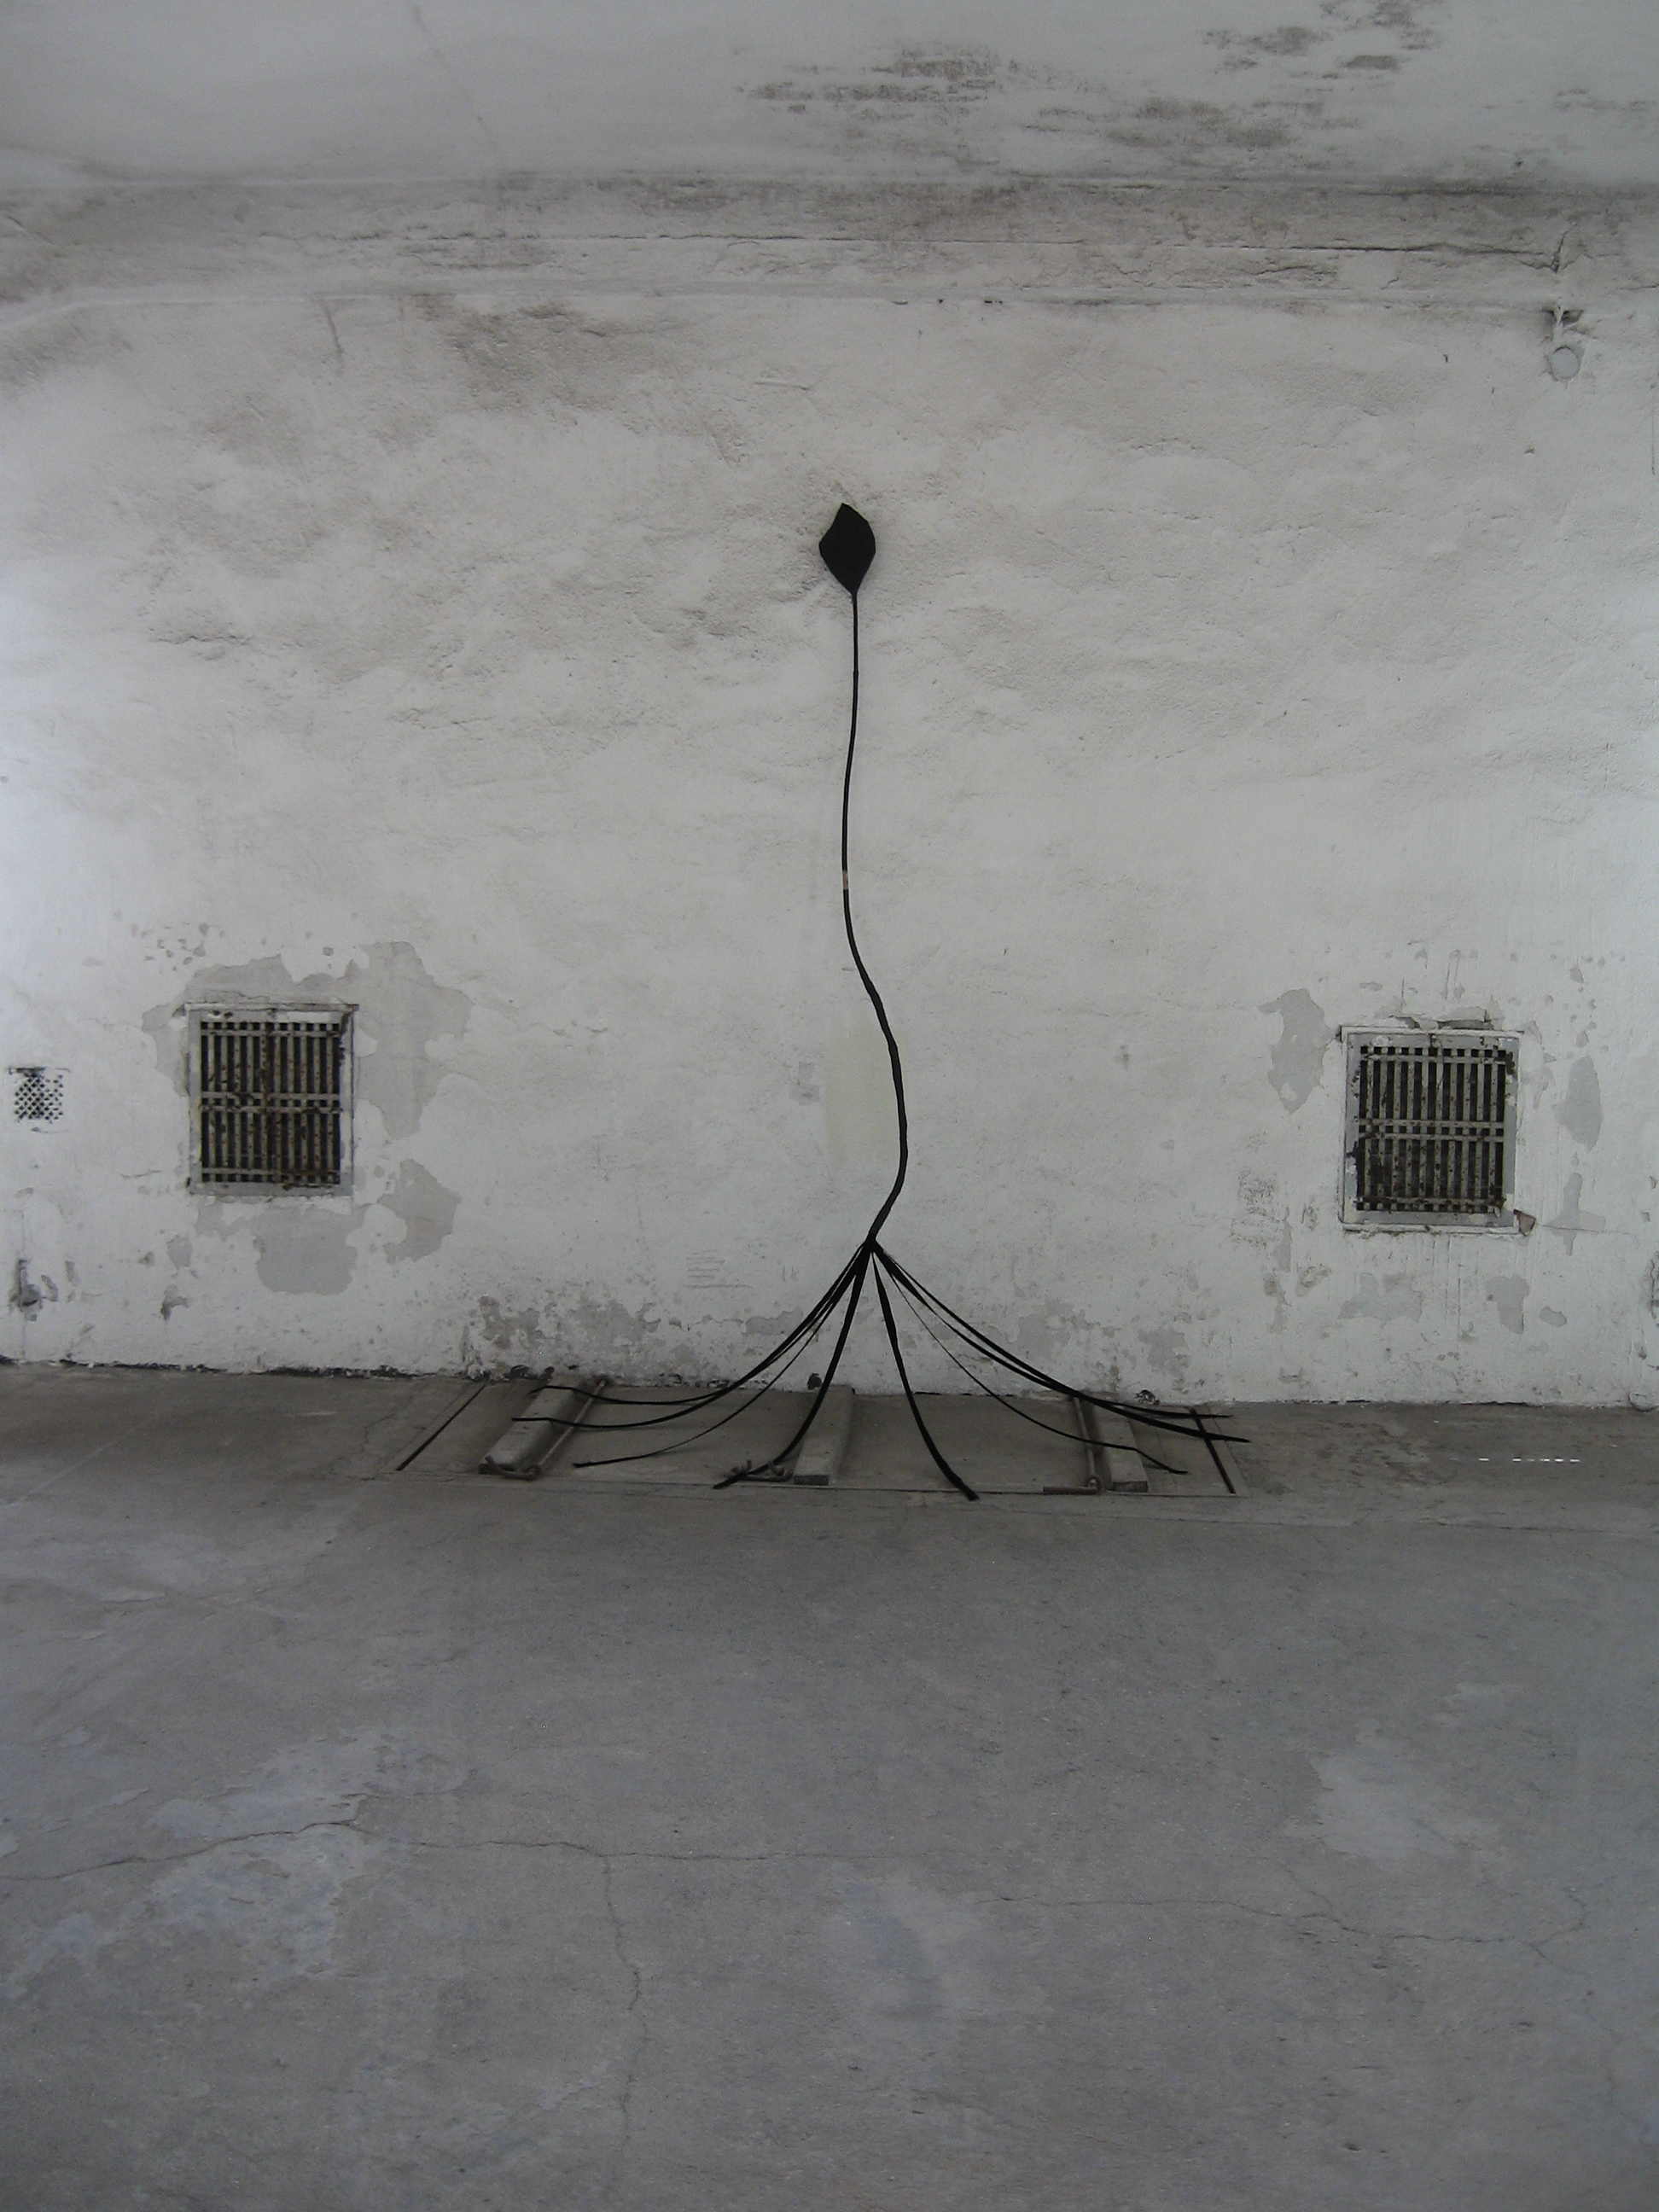 Untitled (tethered arrow), 2010, tree branch, papier-mâché, velvet ribbons, charcoal, H 7' x W 4.5' x D 3'